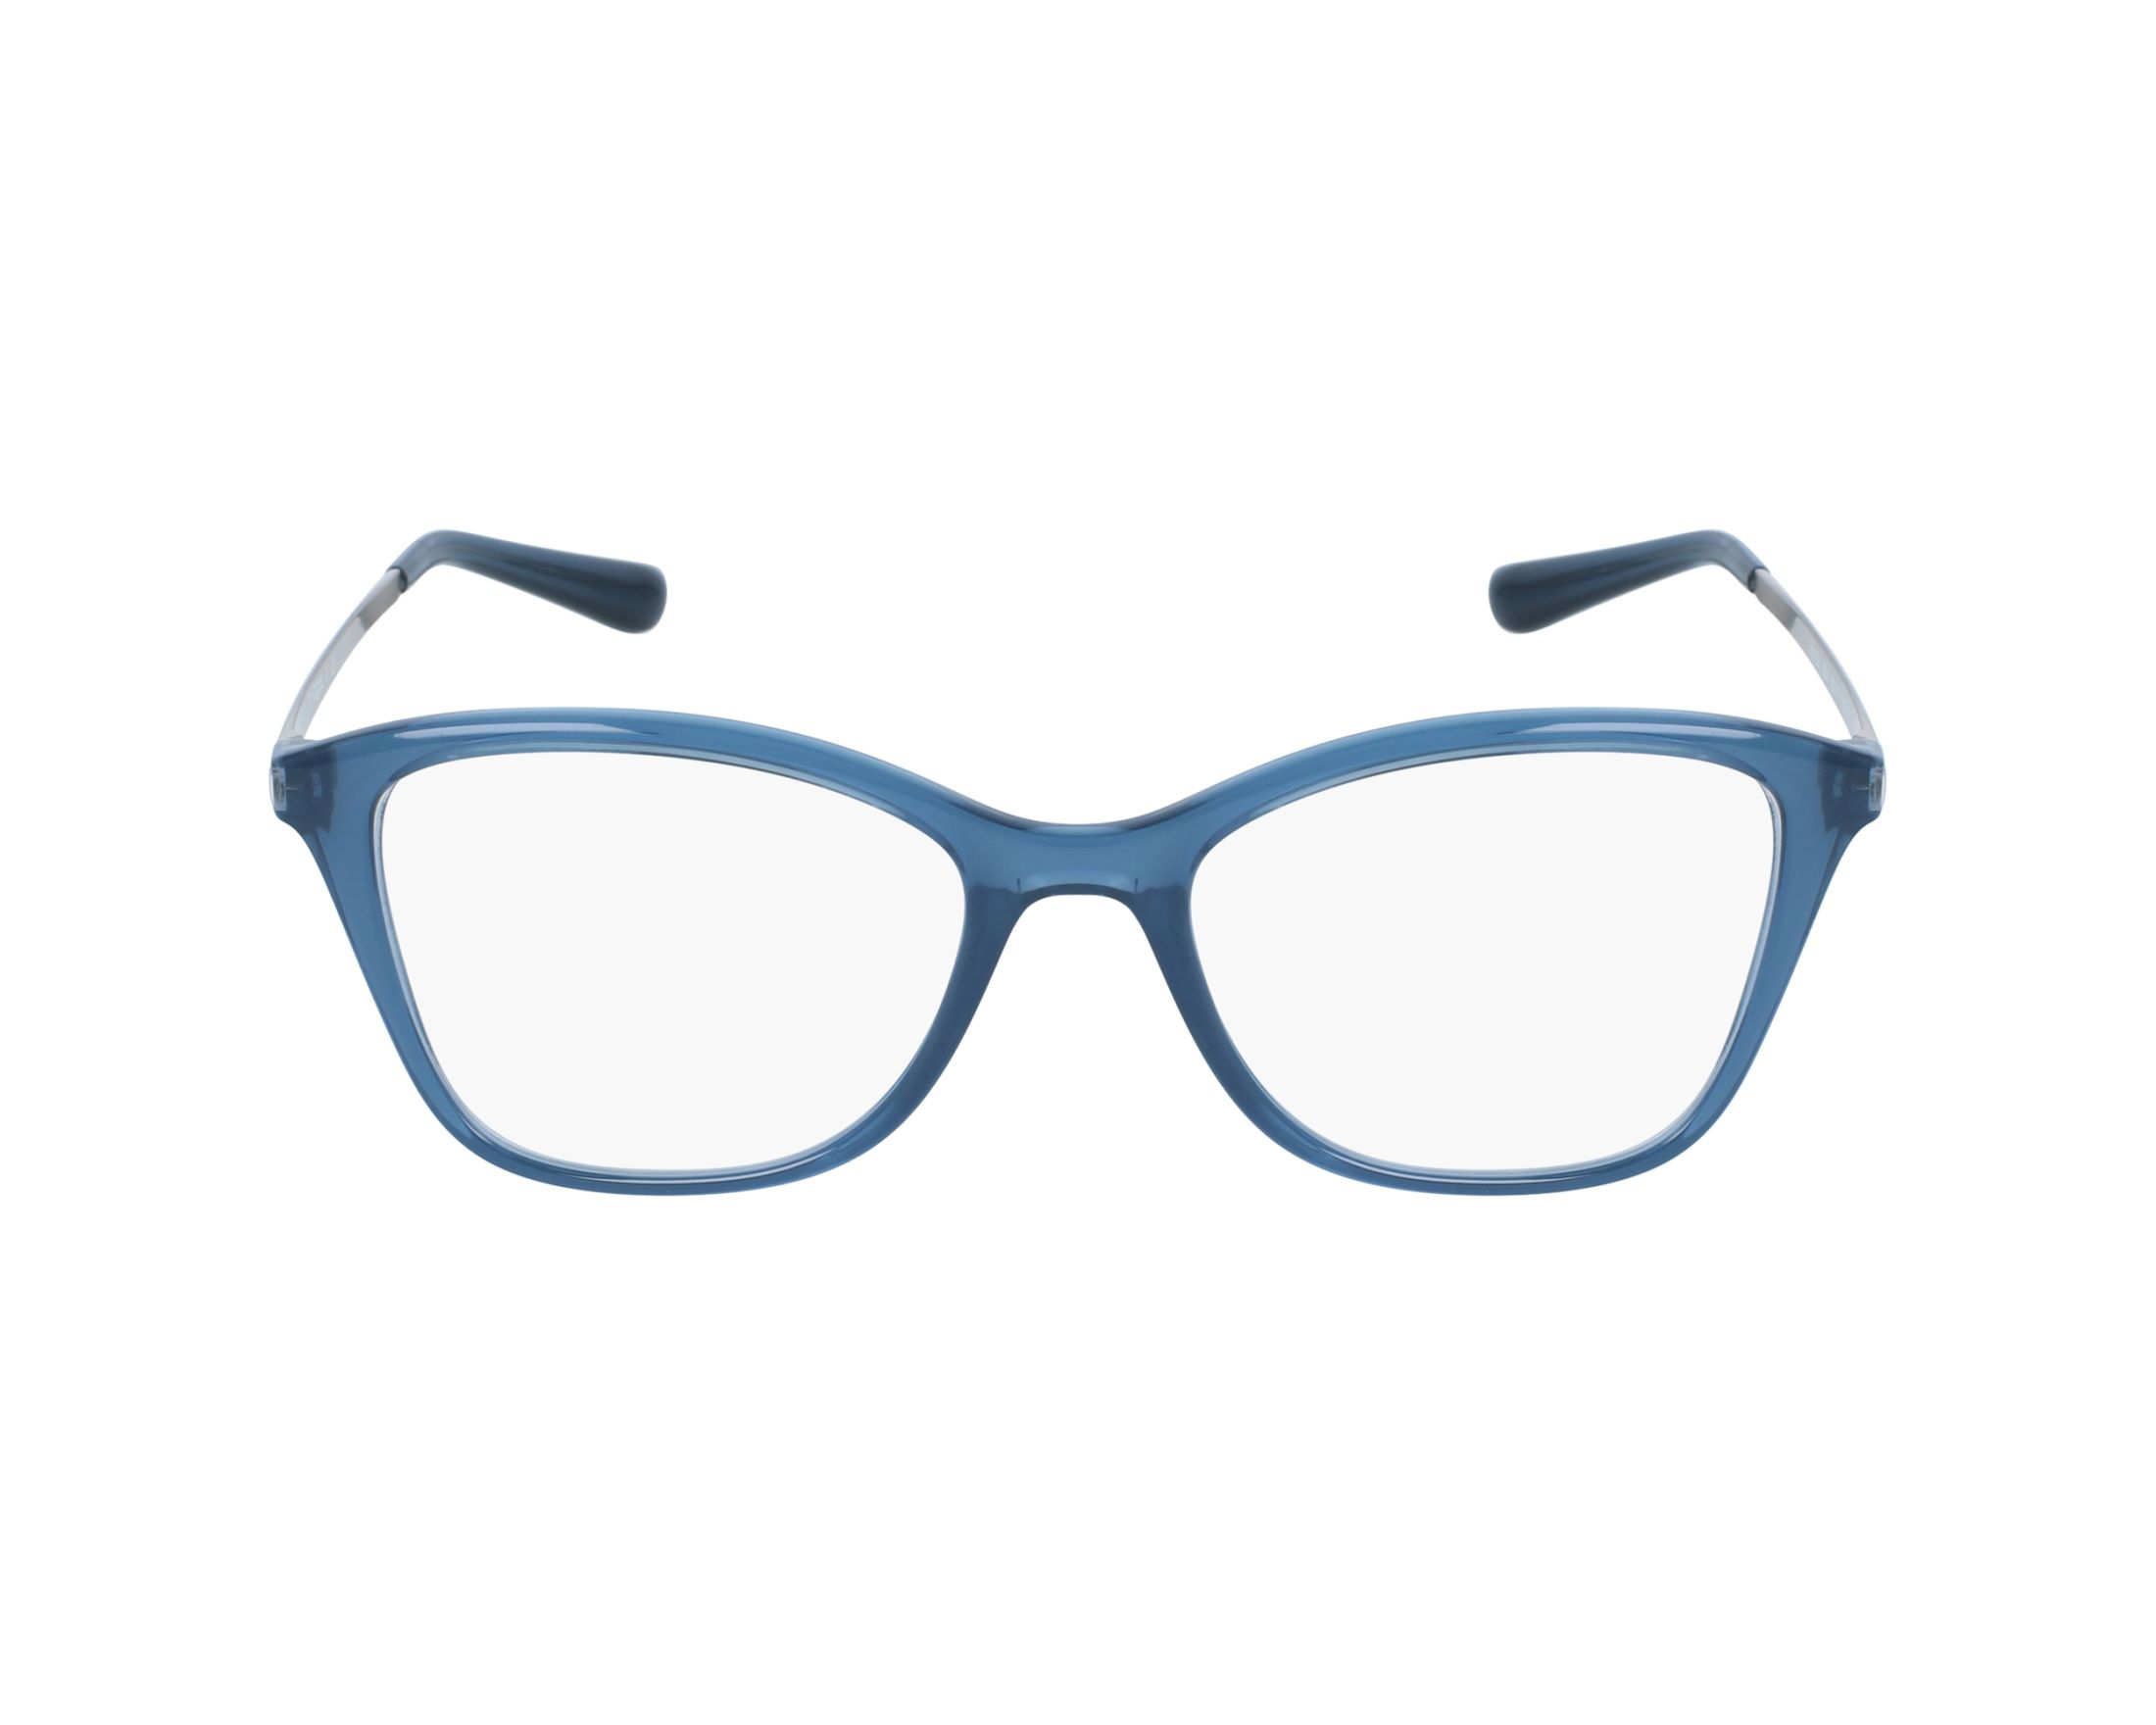 Vogue Eyeglasses Blue VO-5152 2534 - Visionet US